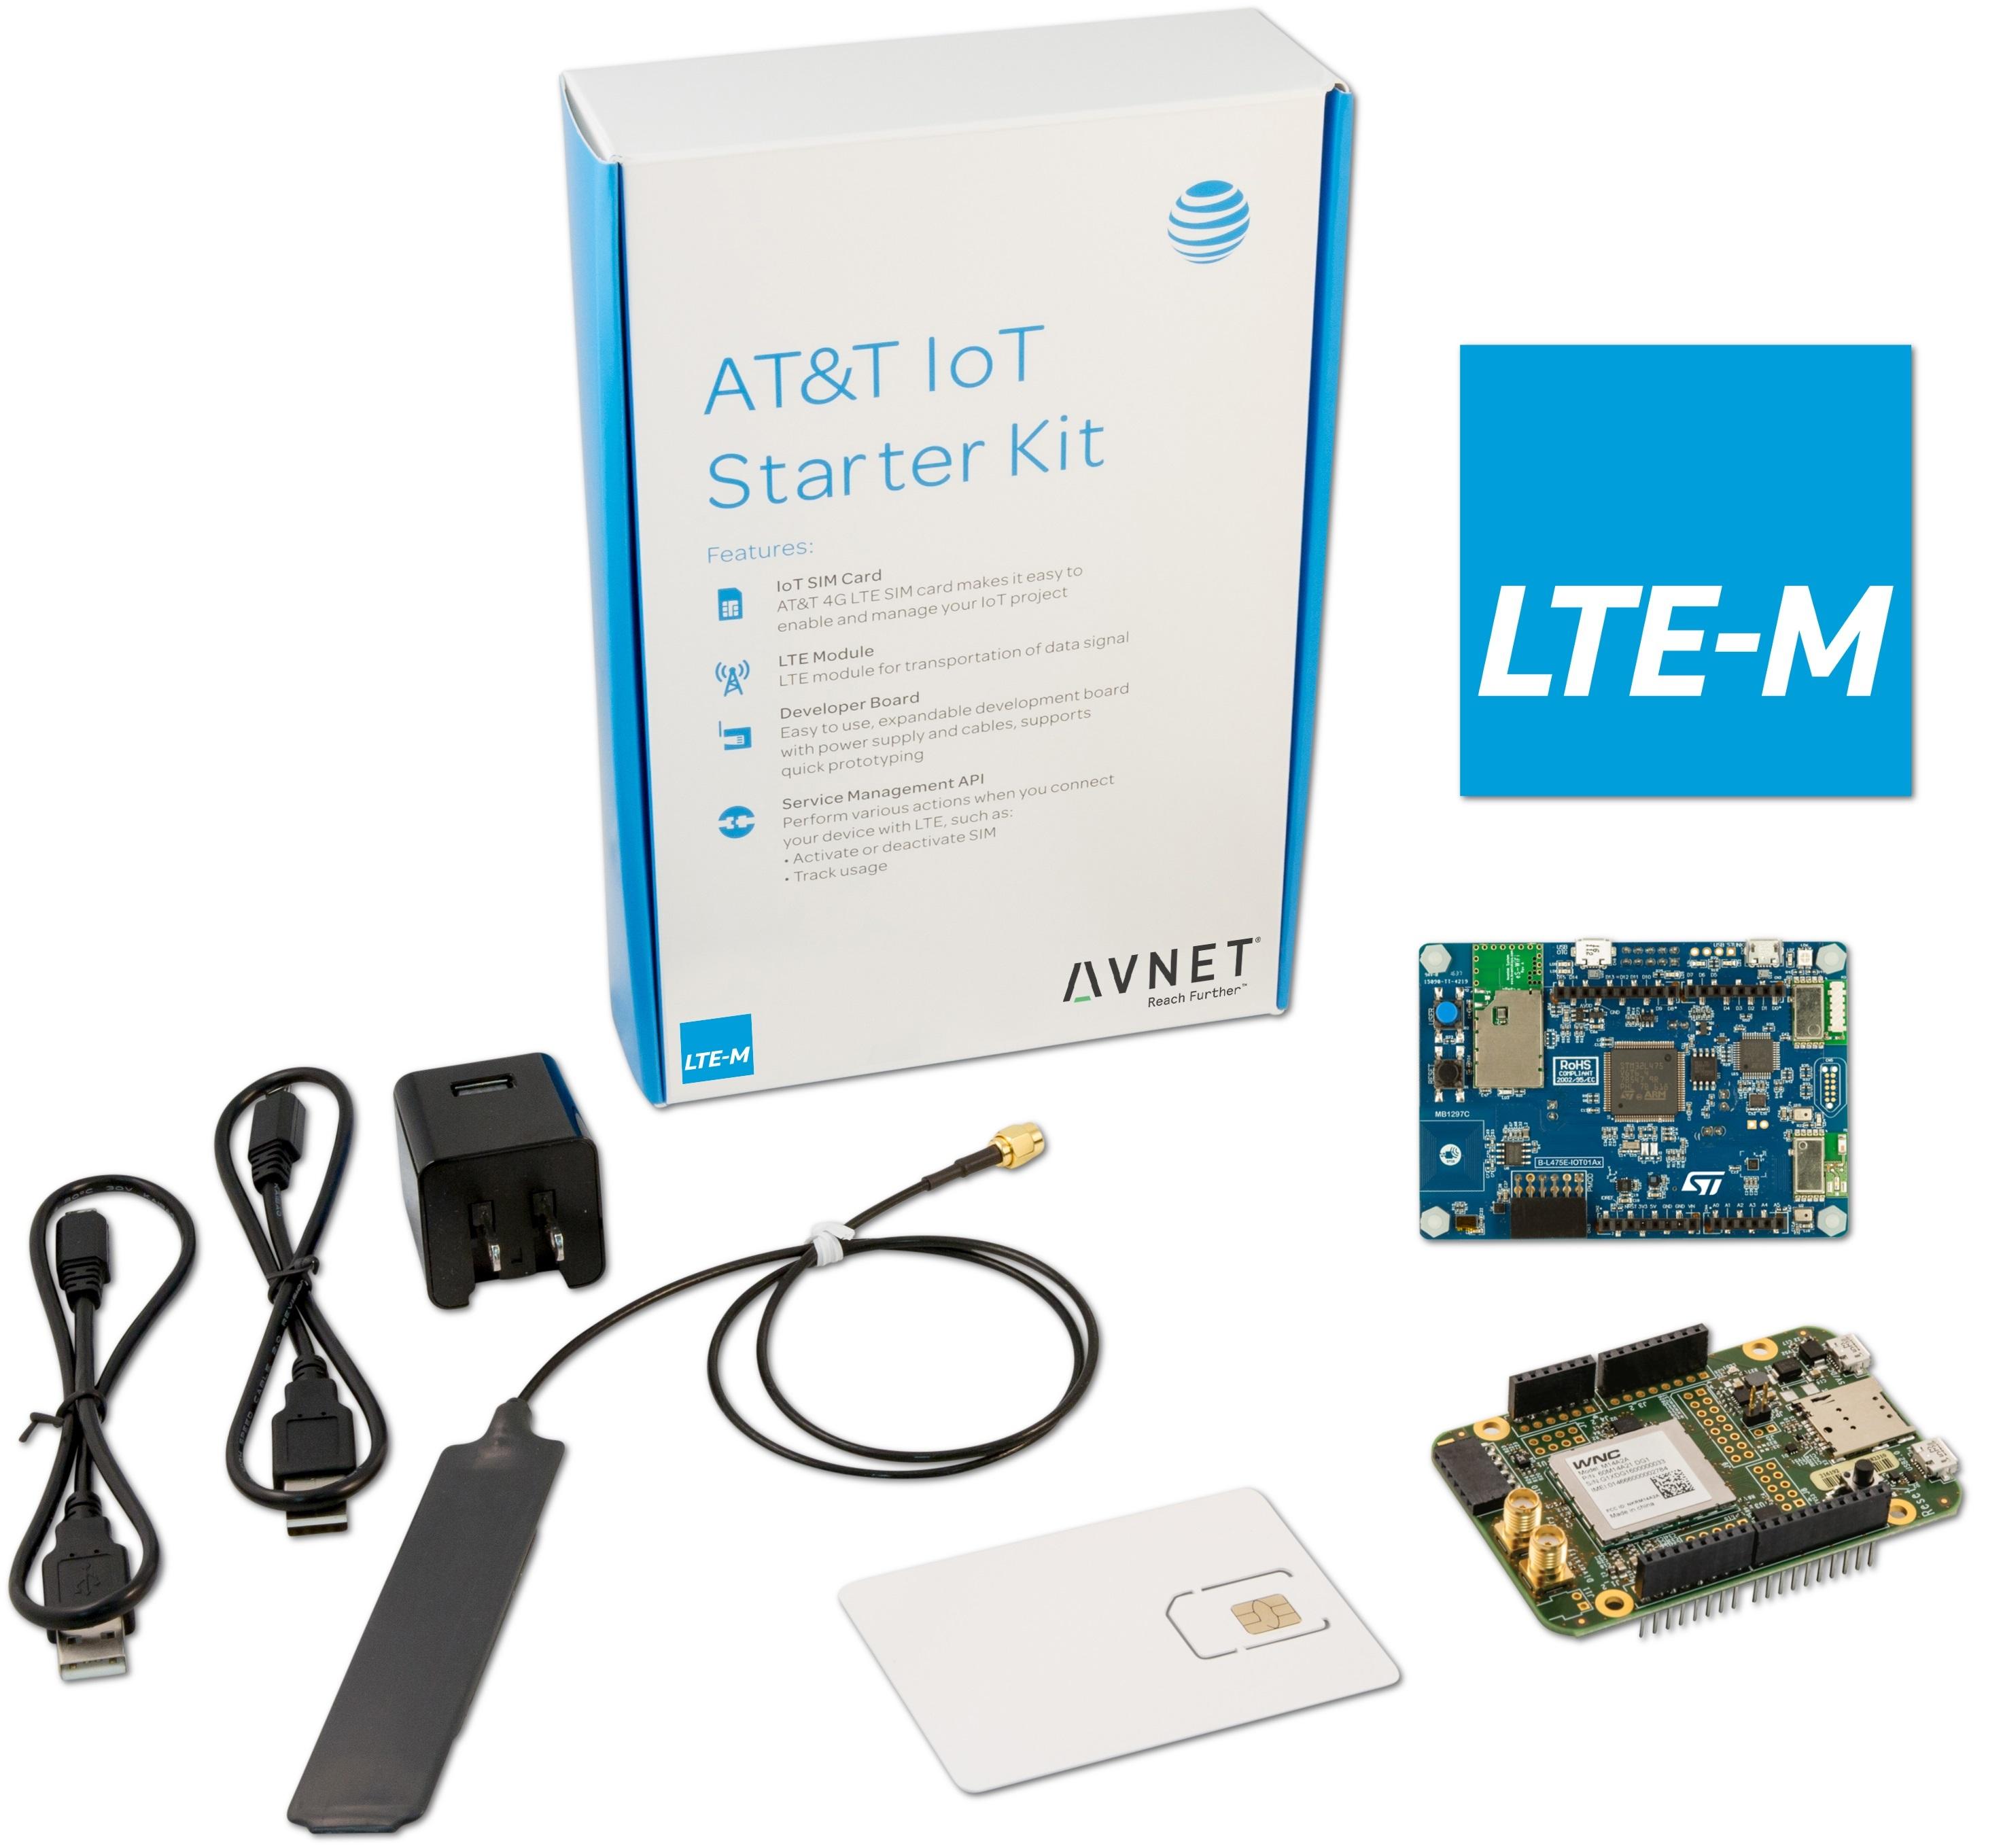 Avnet Boosts Iot Starter Kit Portfolio With New 4g Lte M Development Catalog Prototyping Breadboard Wiring Kits Platform Business Wire